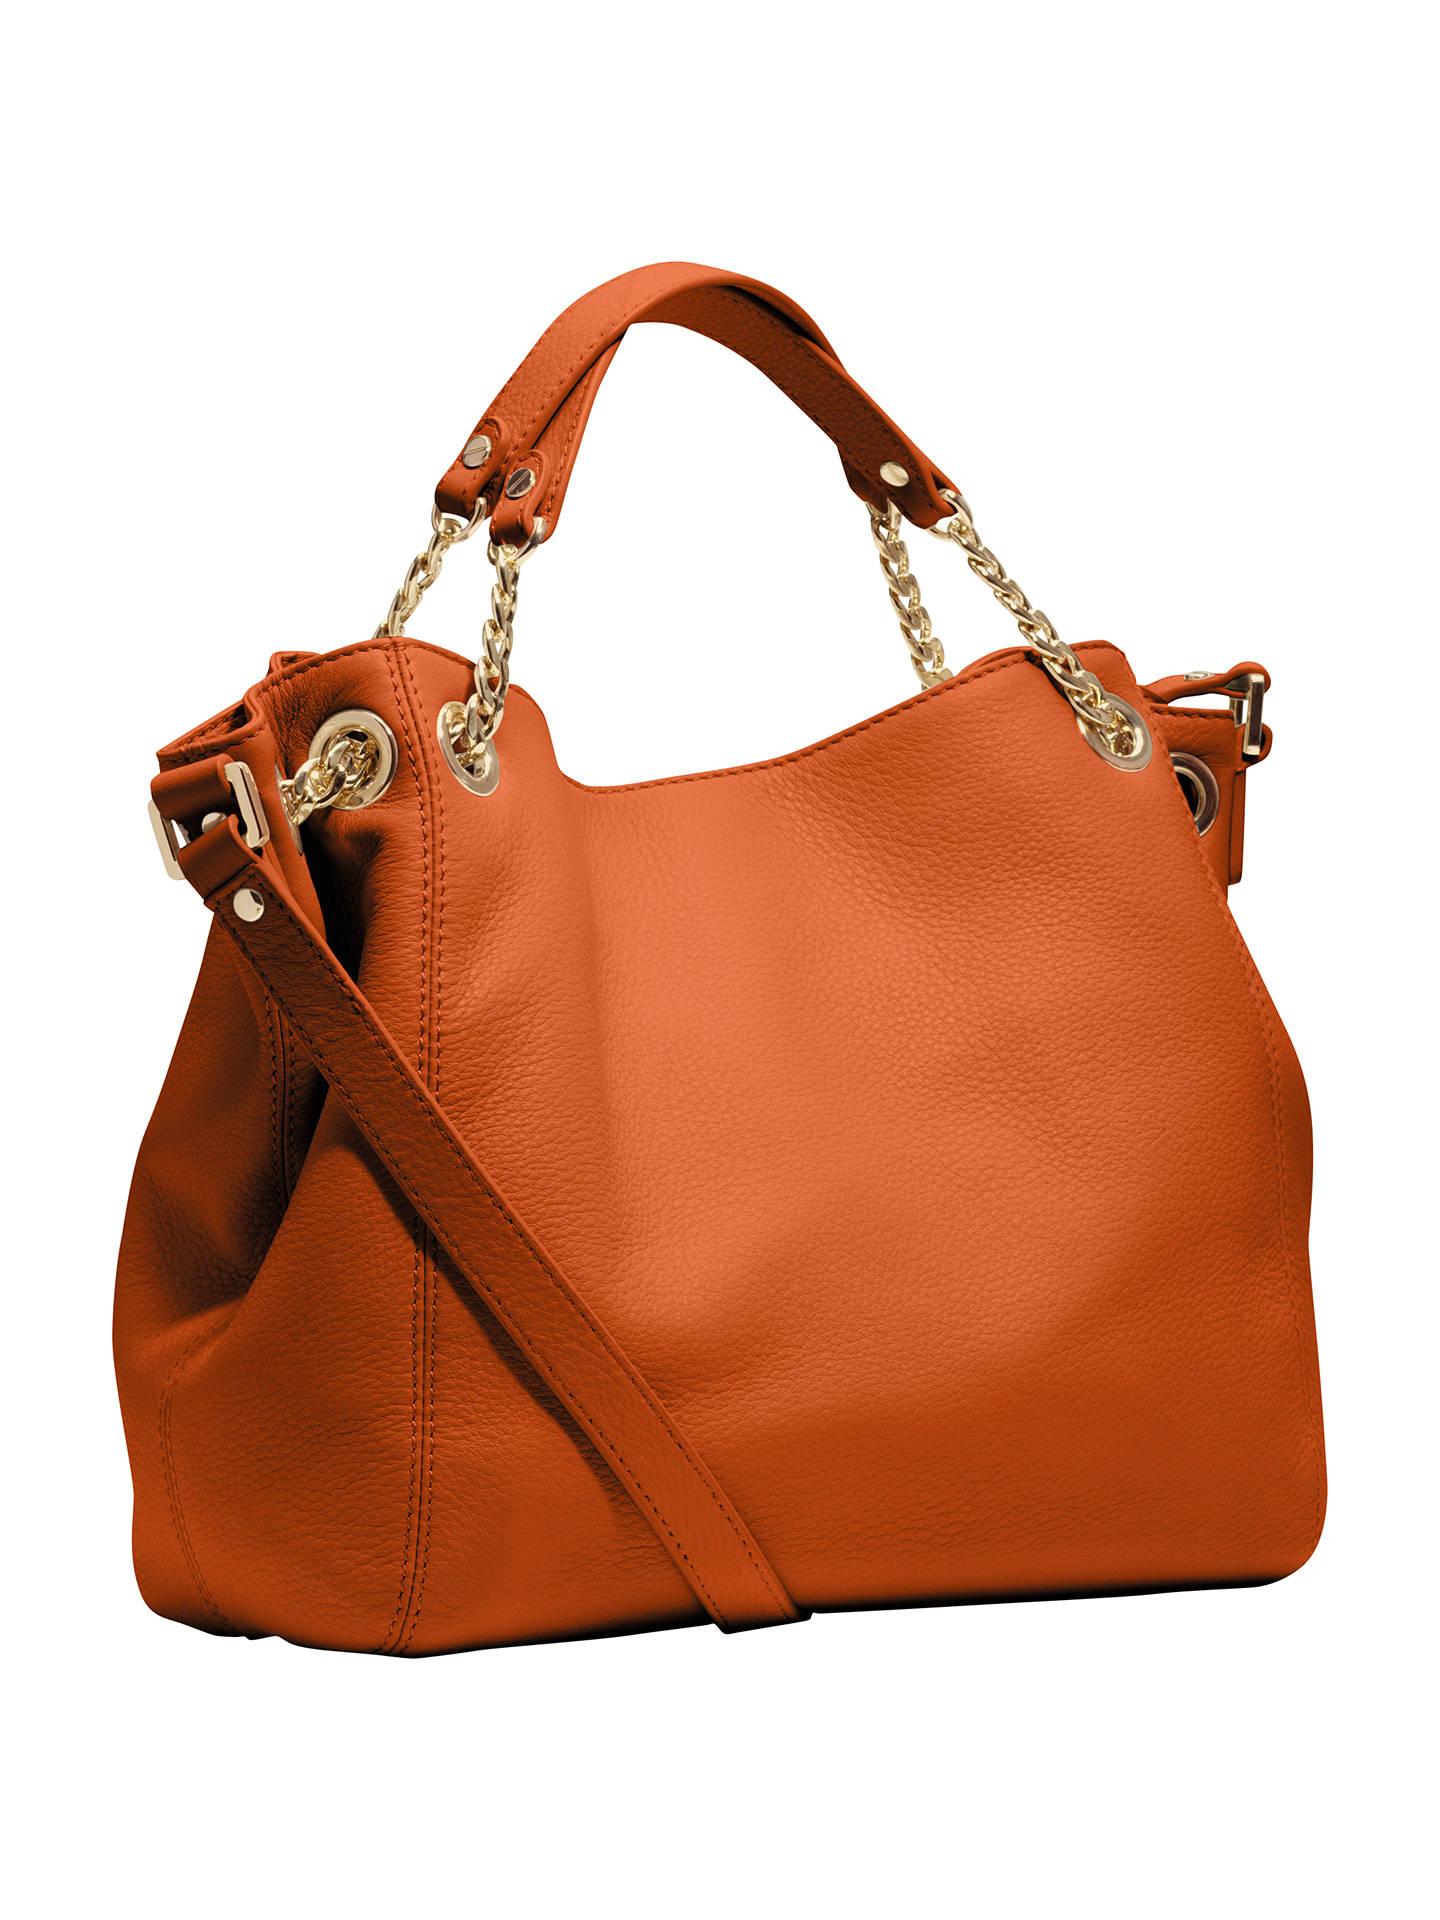 cc82bf235b98 Buy MICHAEL Michael Kors Jet Set Chain Medium Tote Handbag, Tangerine  Online at johnlewis.